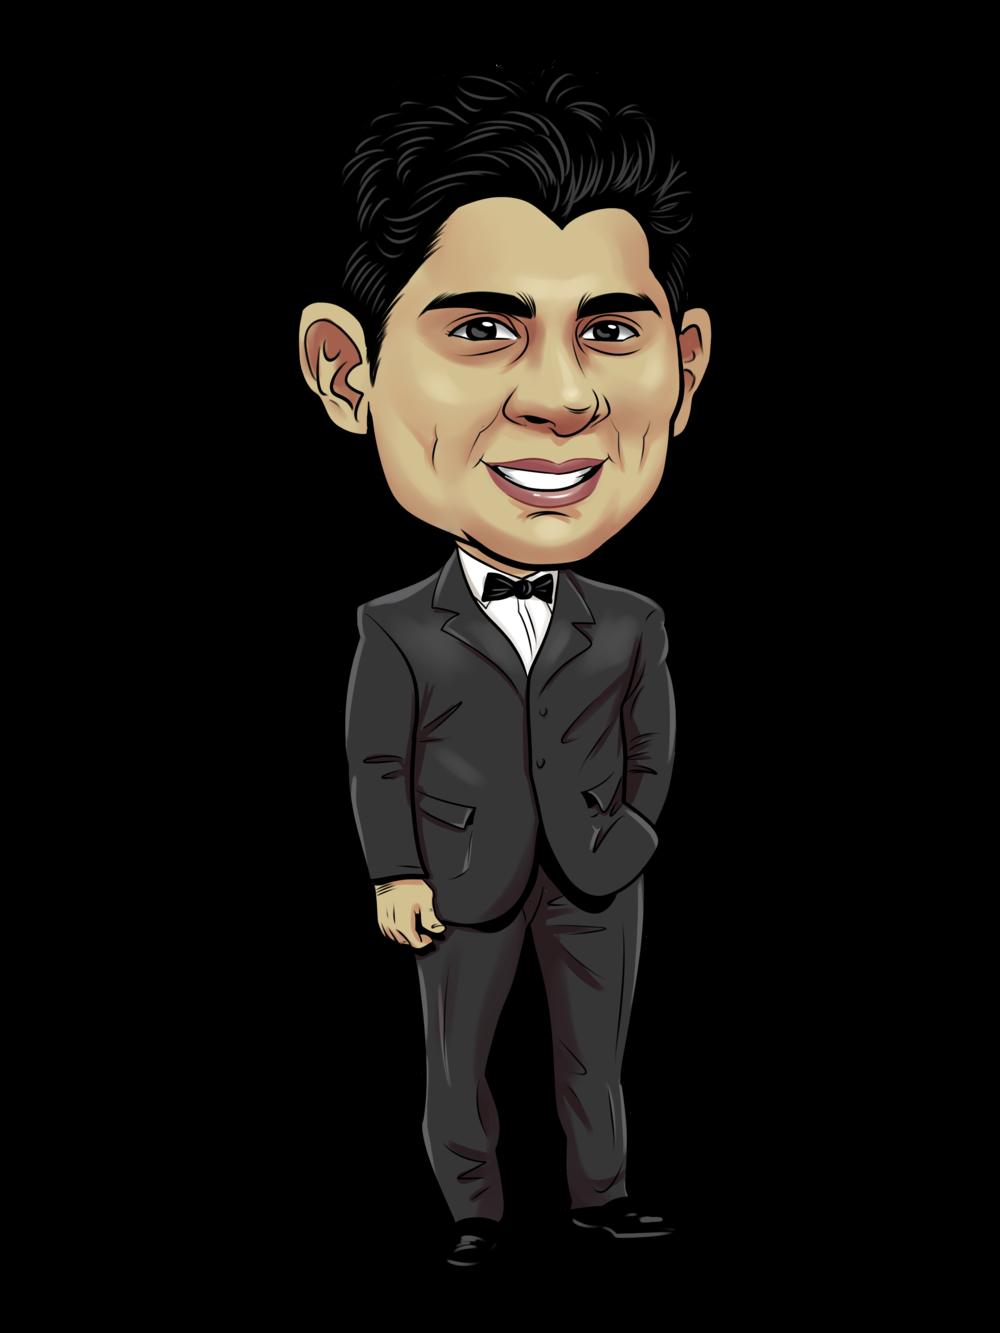 Manish Patel     FOUNDER, IBM'S WATSON OF BUSINESS